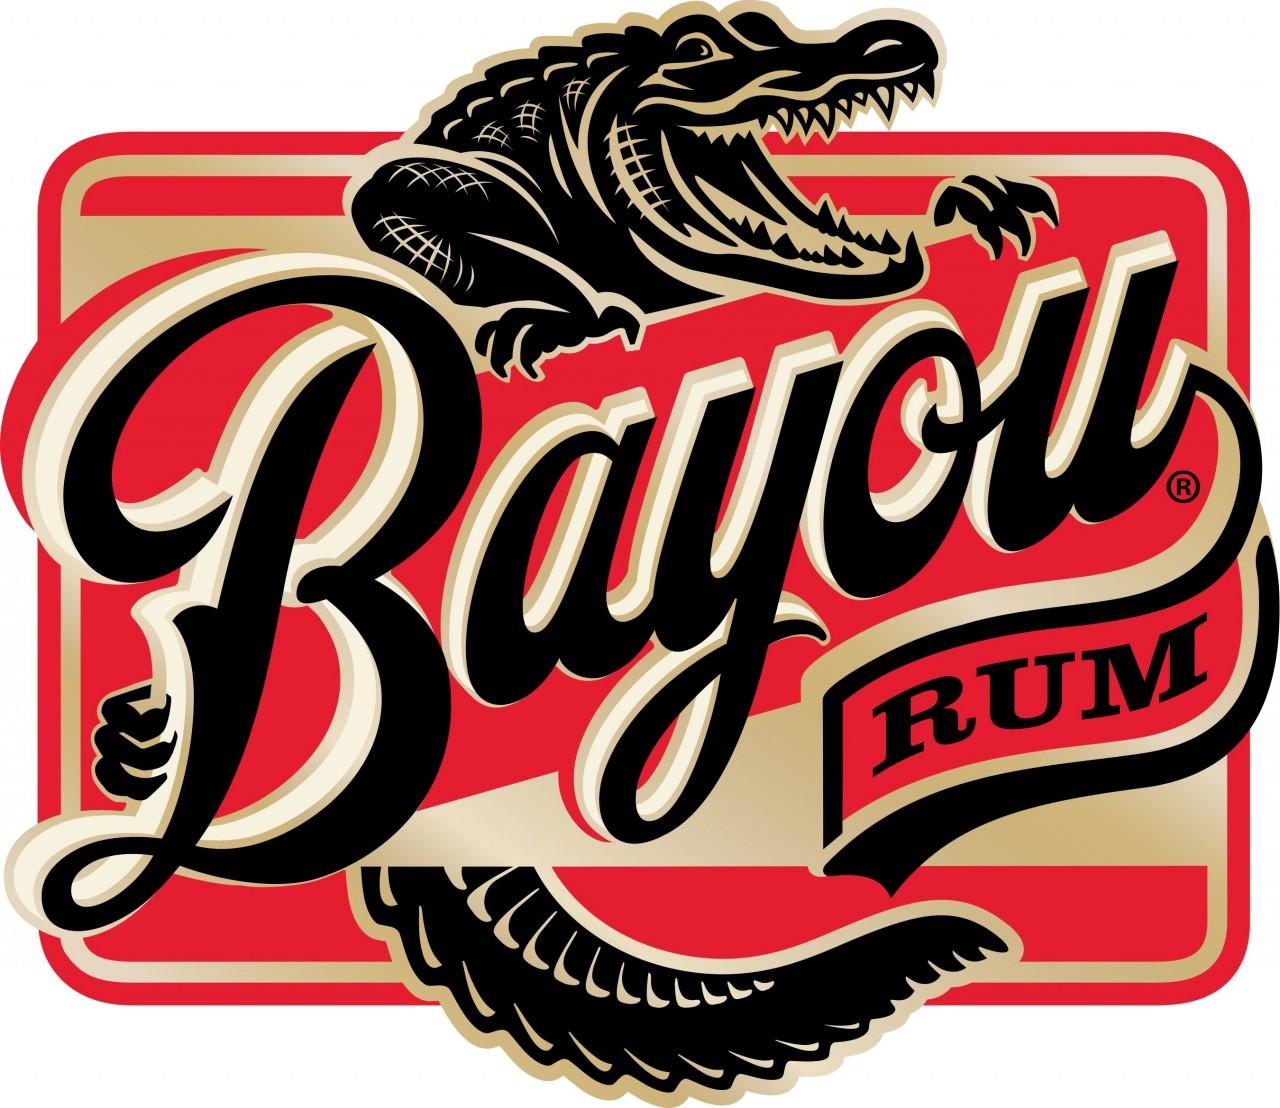 Bayou Rum Celebrates National Rum Day with #MakeRumGreatAgain